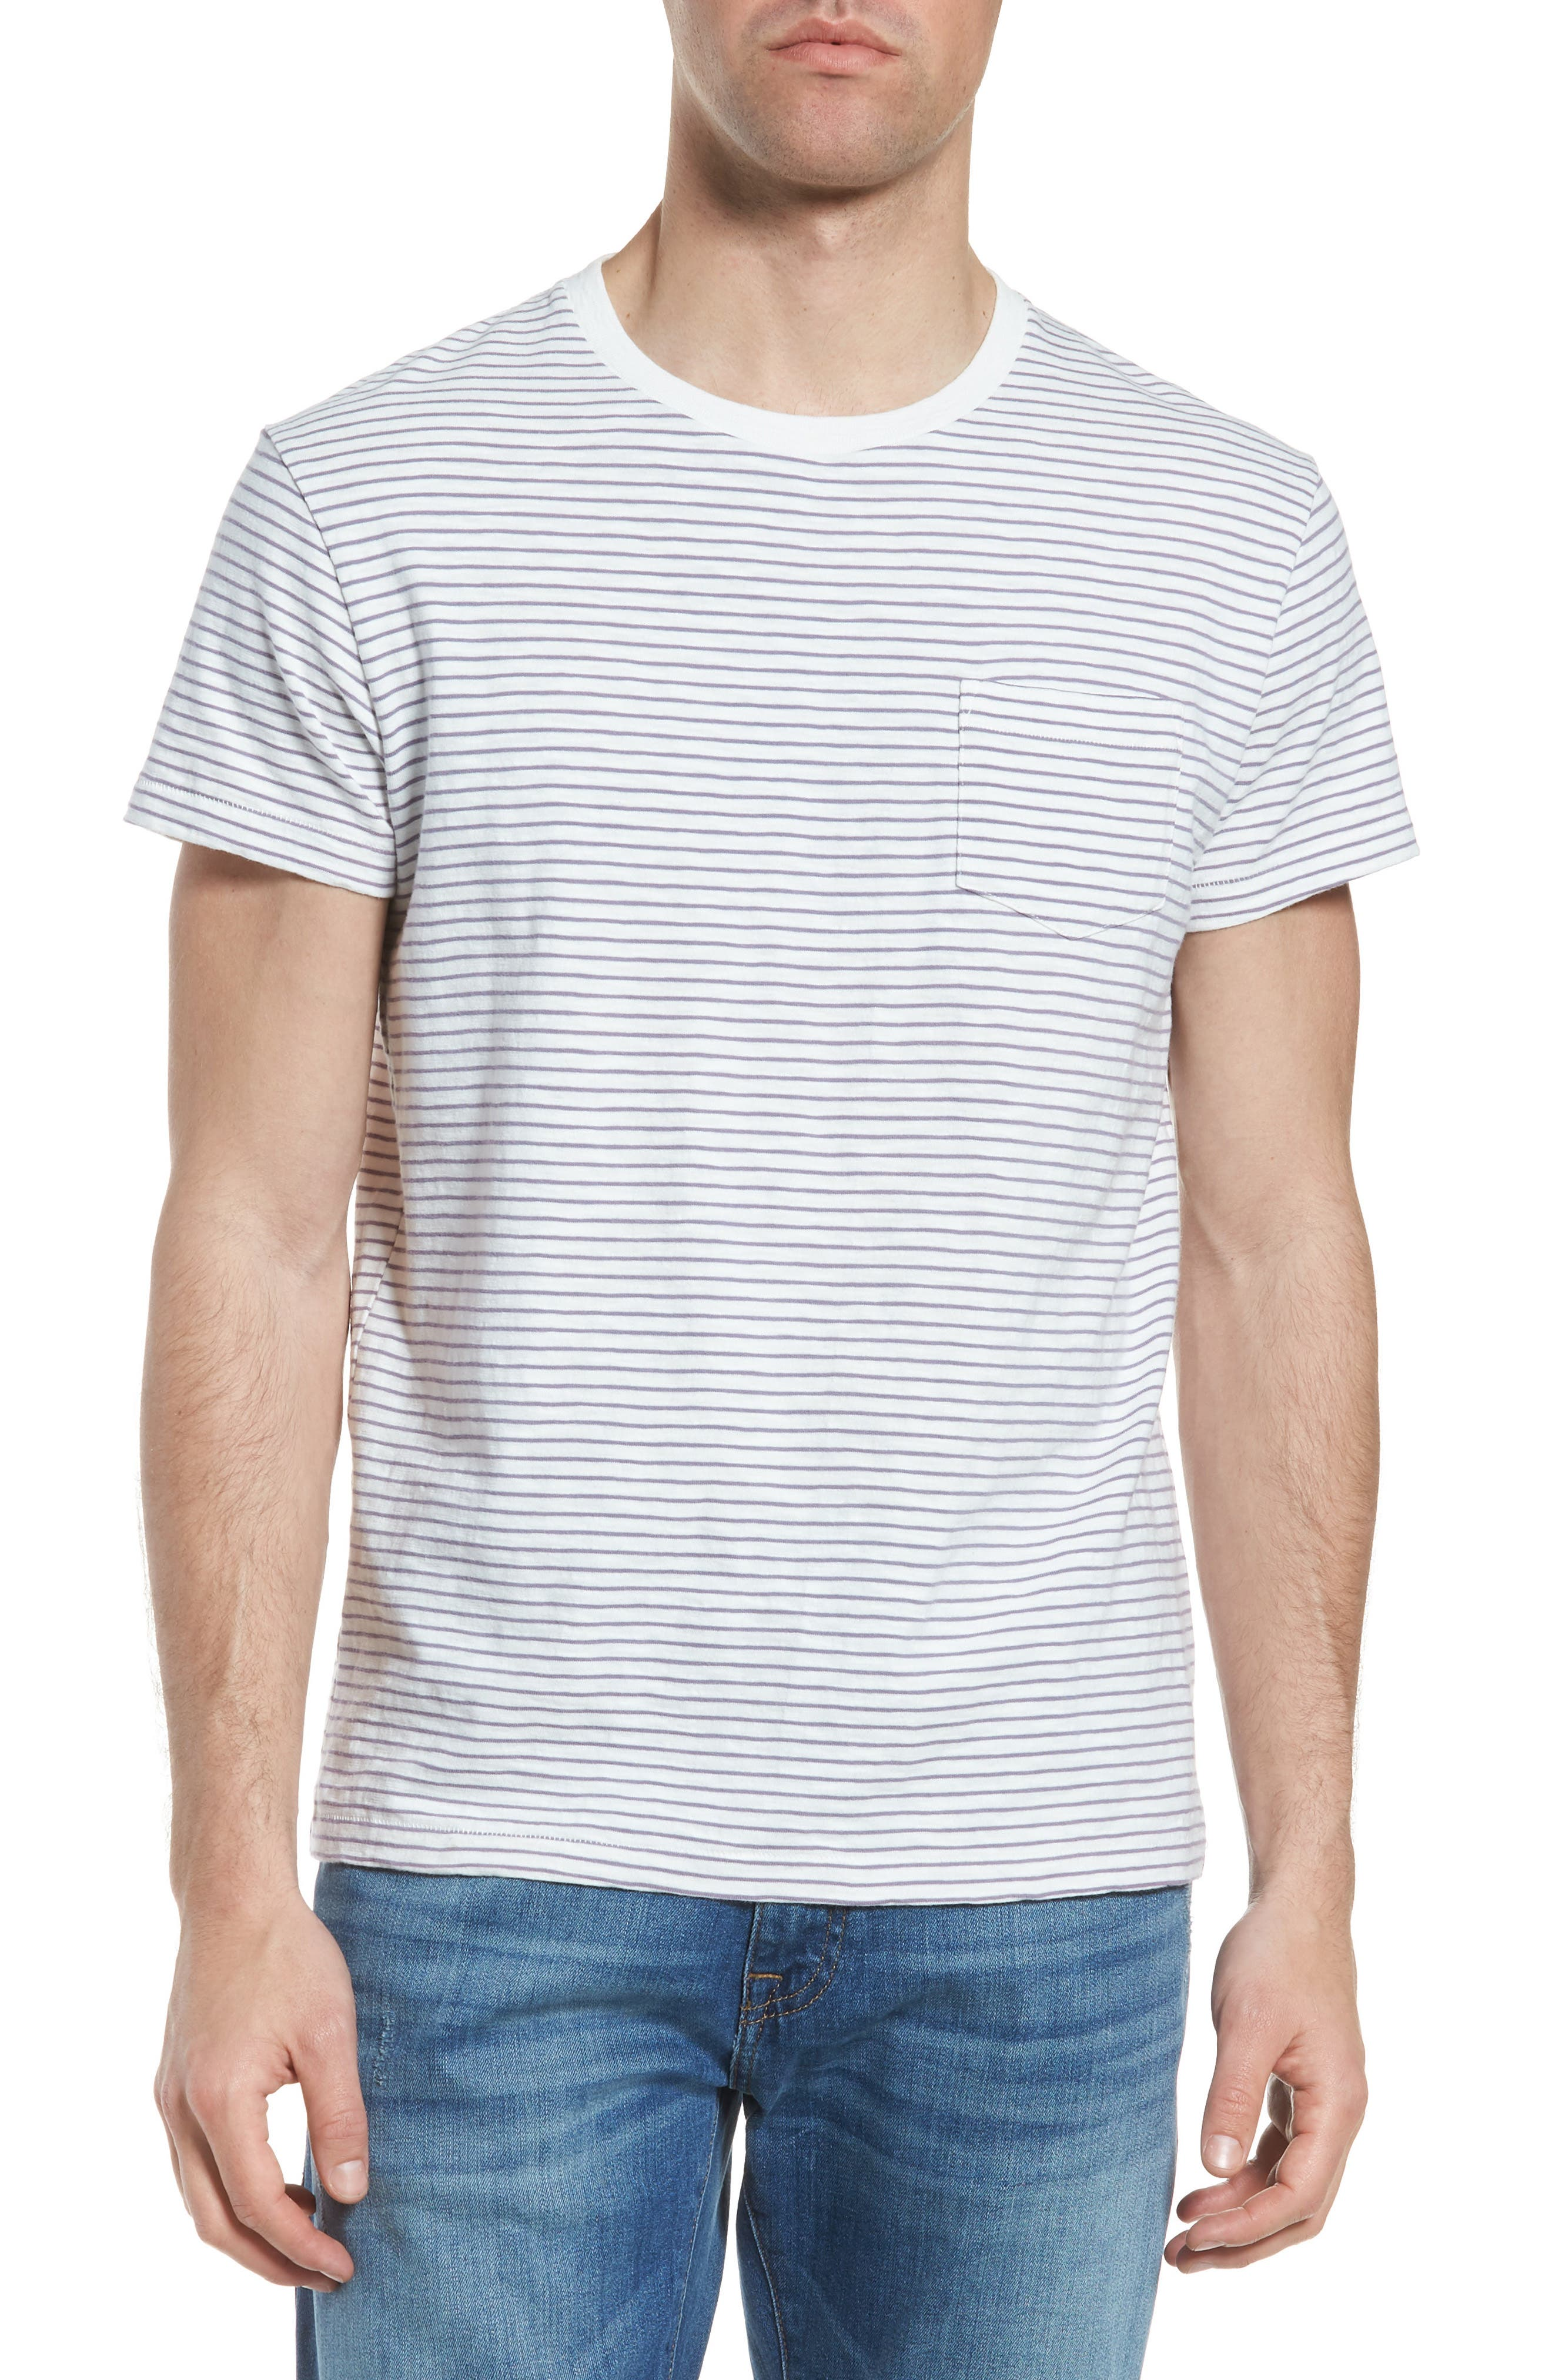 Malaga Cove Stripe T-Shirt,                         Main,                         color, 114